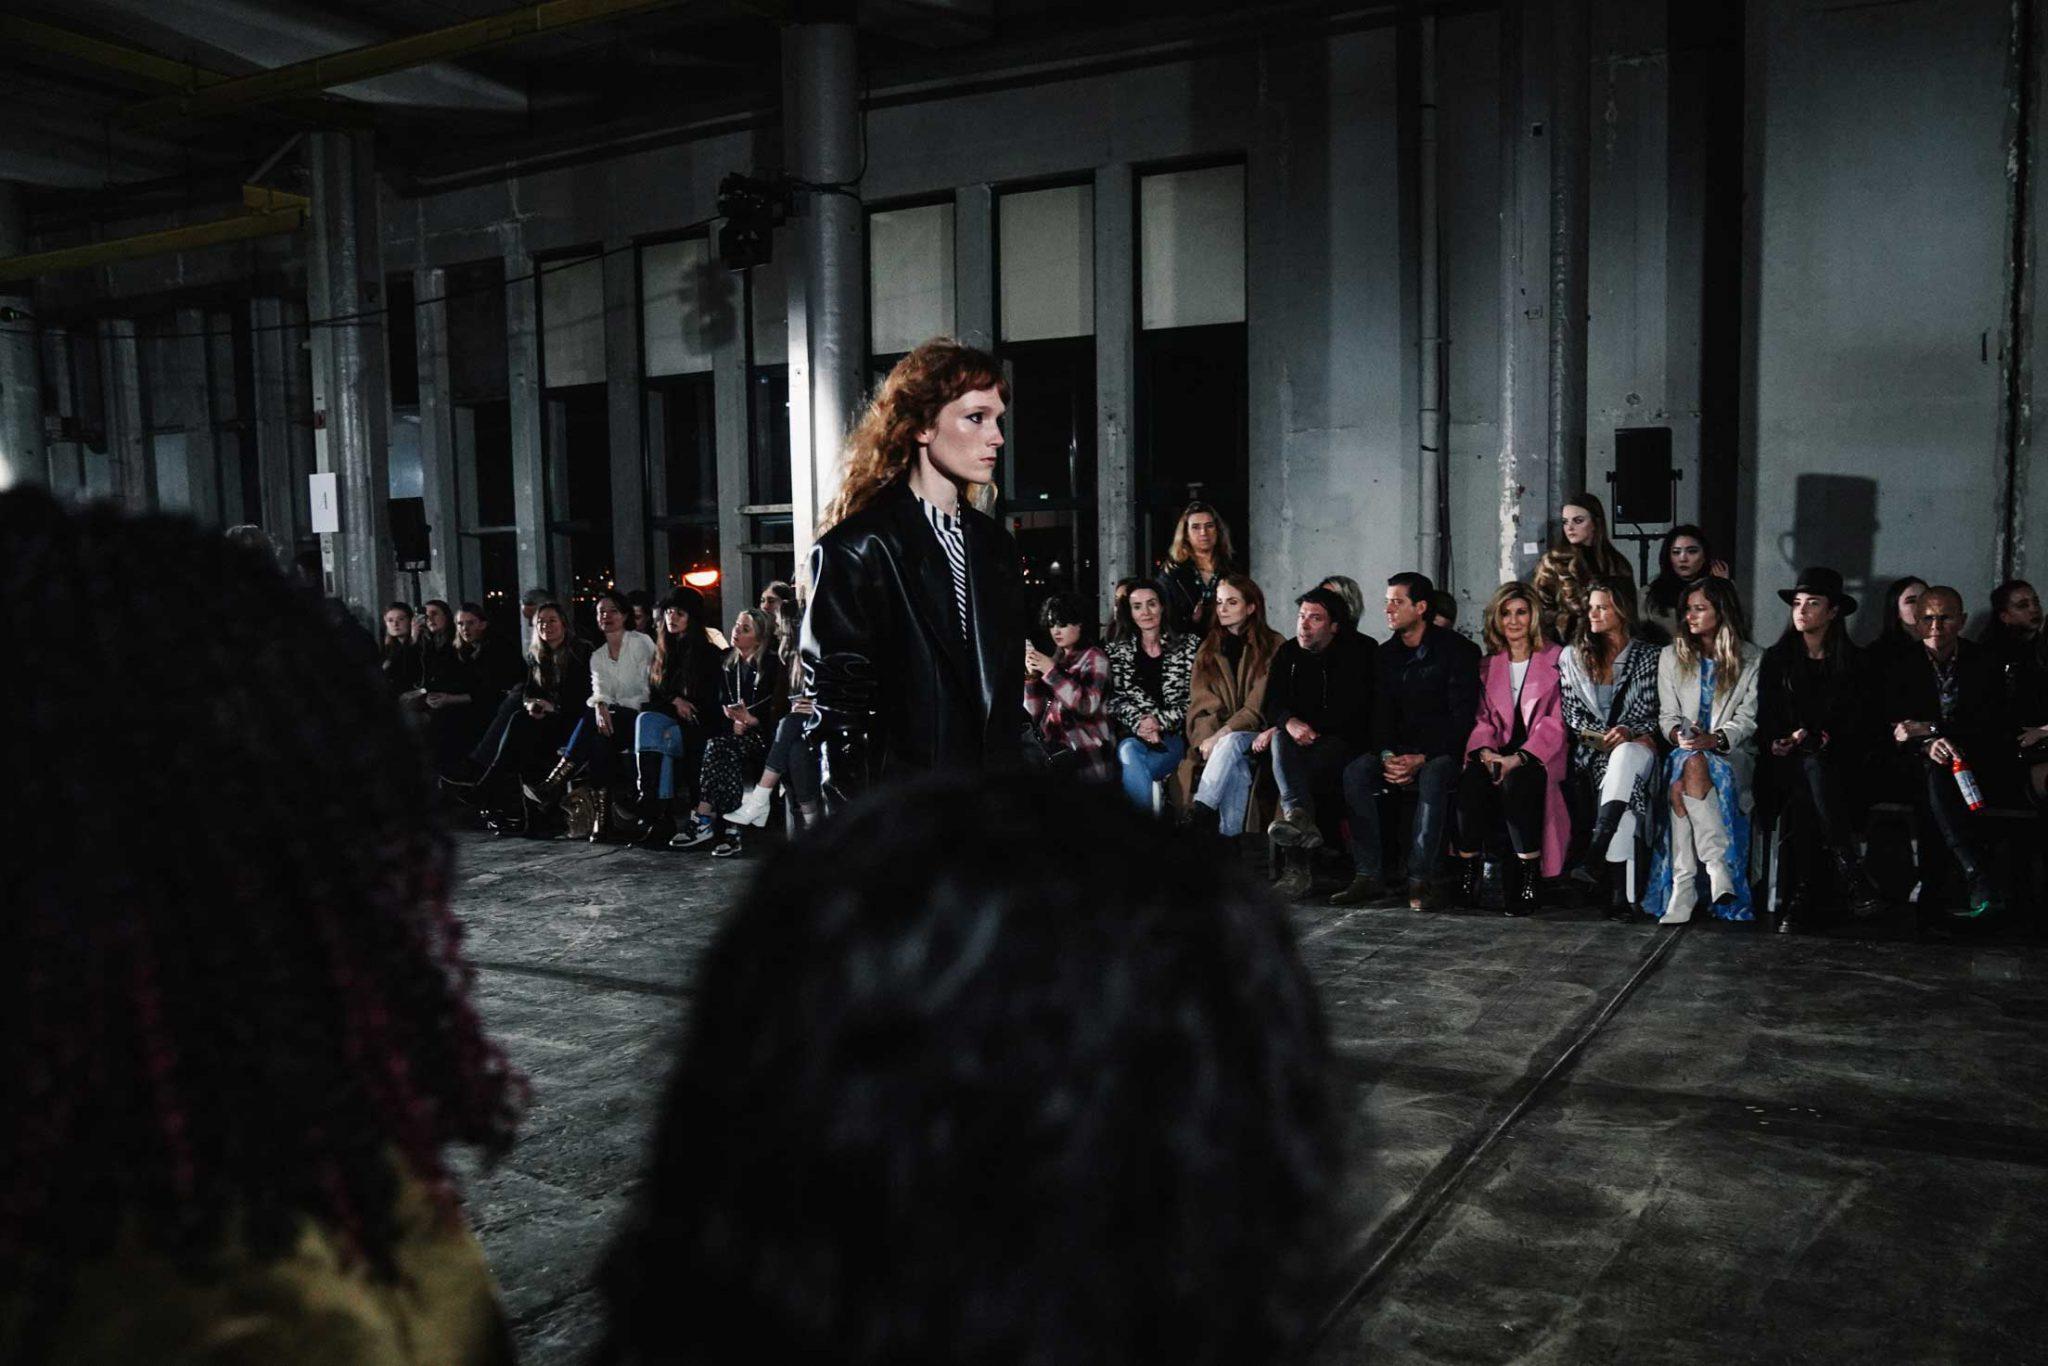 Ilsoo_van_Dijk_Ilsoovandijk_AFW_Toral_Backstage_Amsterdam_Fashion_week_2020_-scaled_17g